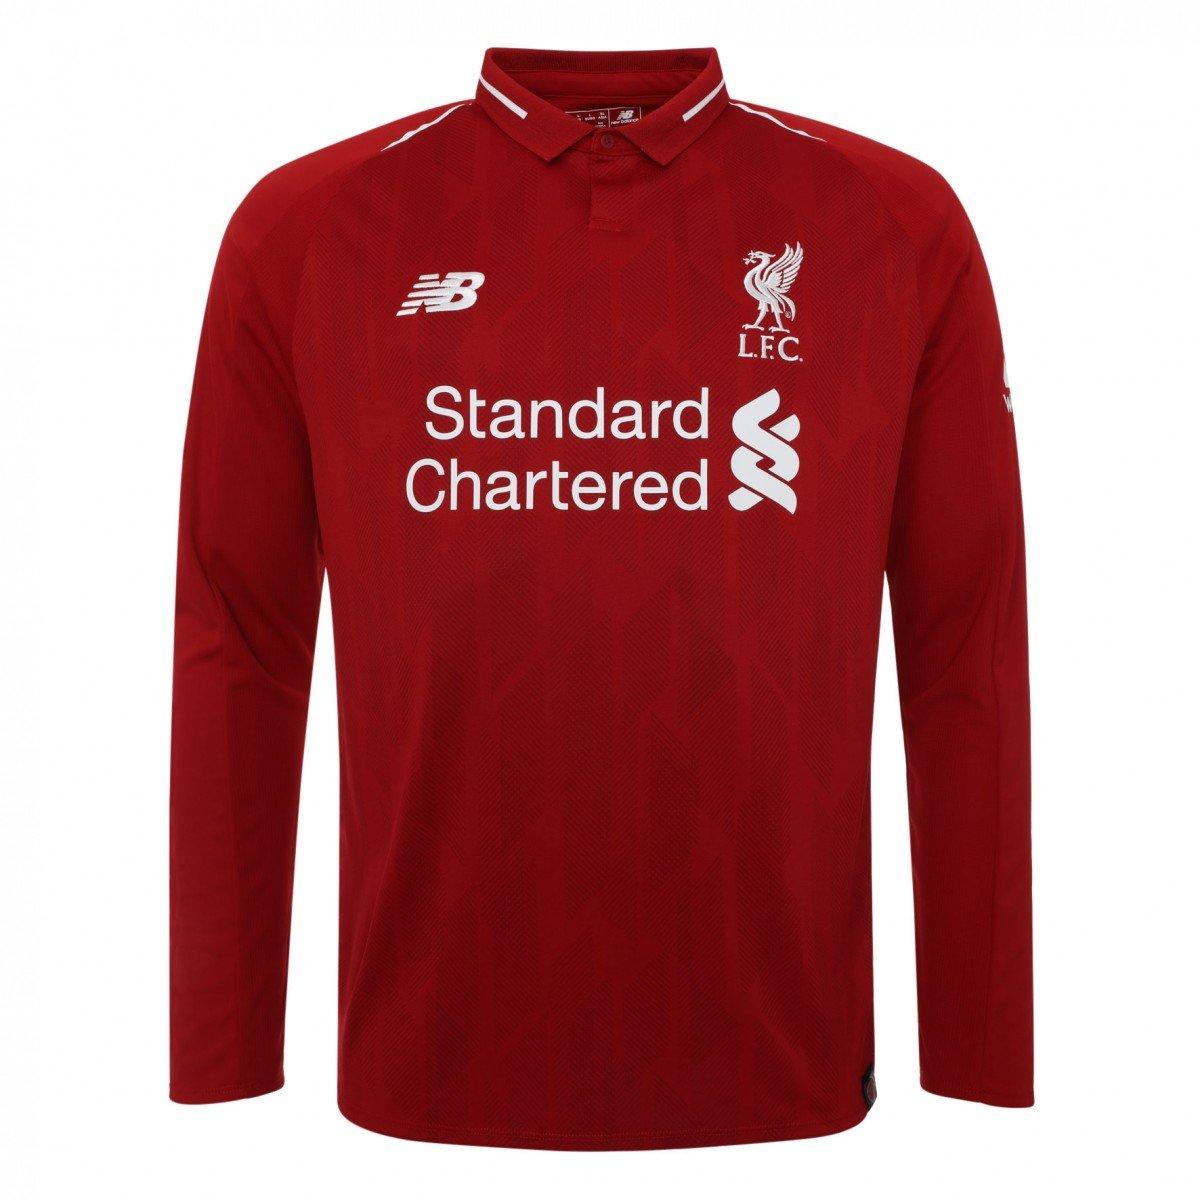 42ae368ed Amazon.com : 2018-2019 Liverpool Home Long Sleeve Football Soccer T-Shirt  Jersey (Virgil Van Dijk 4) : Sports & Outdoors